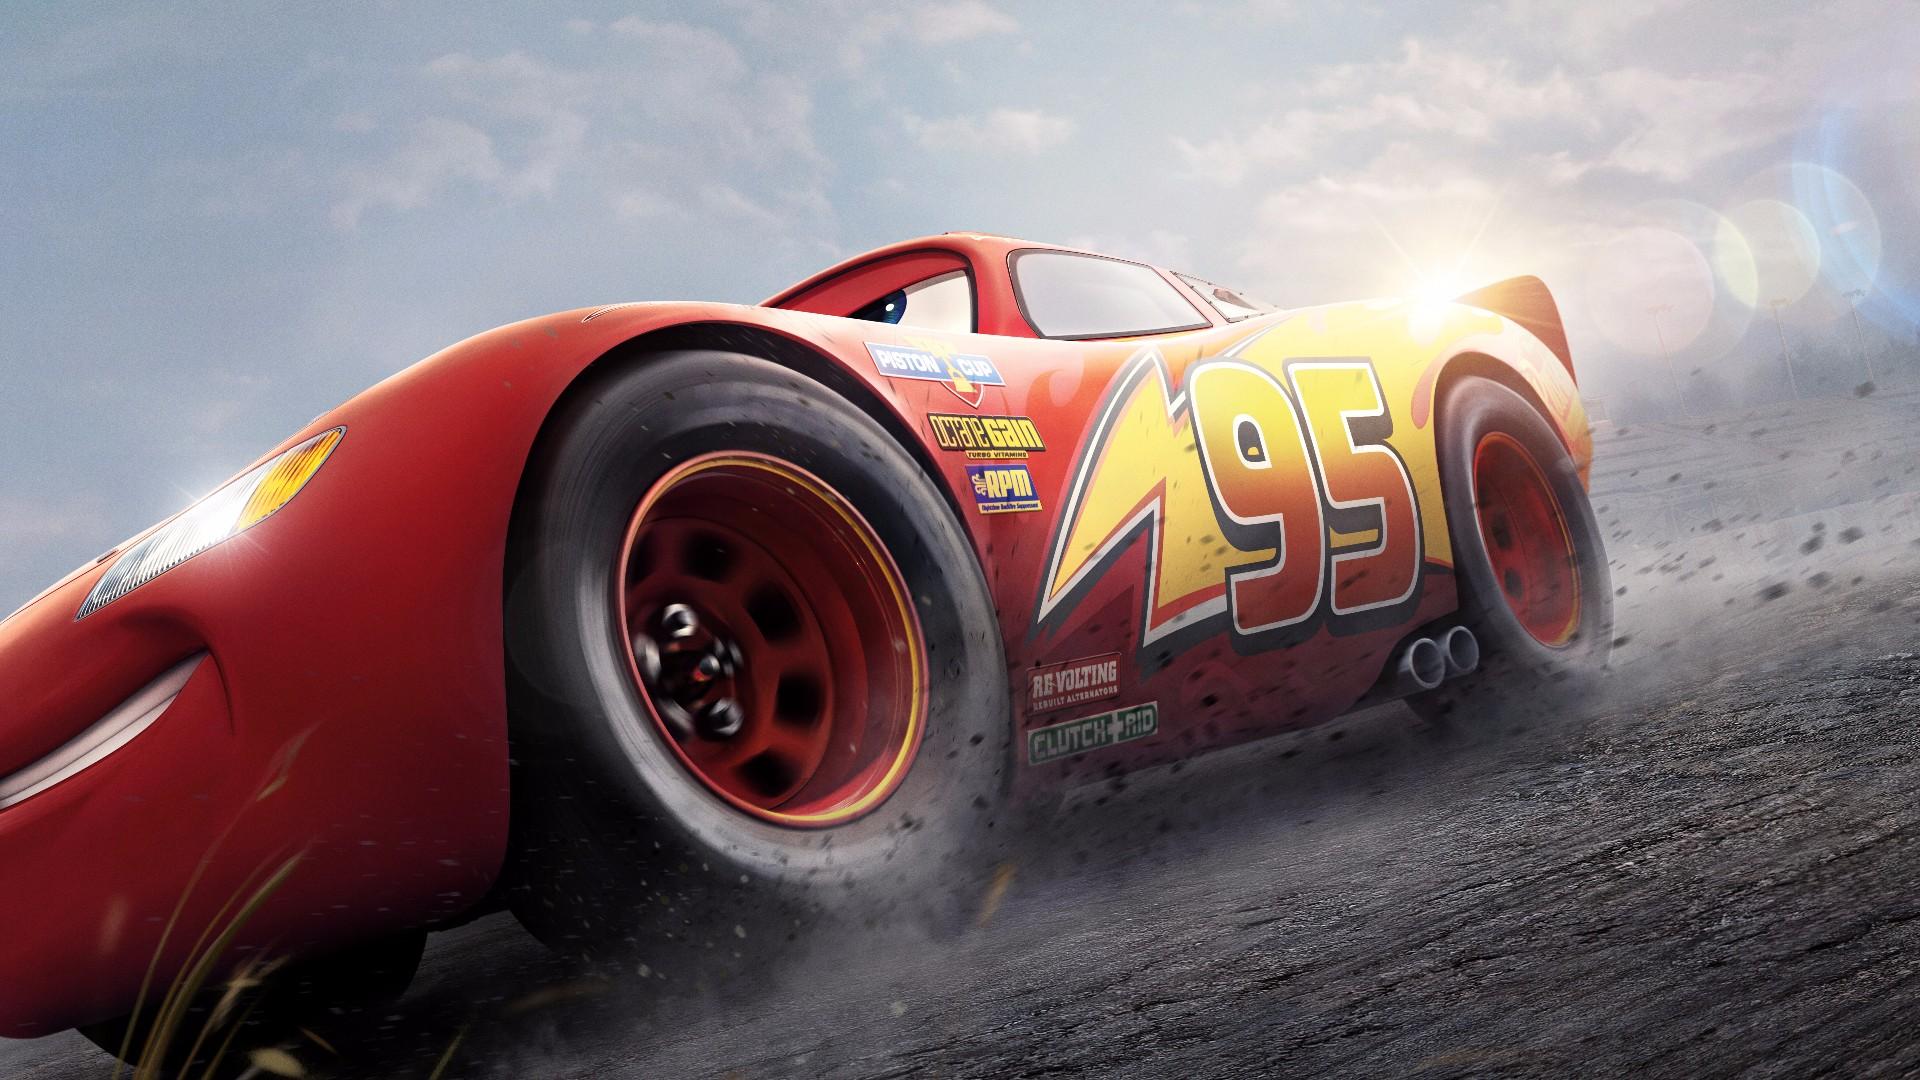 cars wallpapers mcqueen lightning movies pixar 4k fanart background tv er dvd releases october desktop login please backgrounds resolution animated